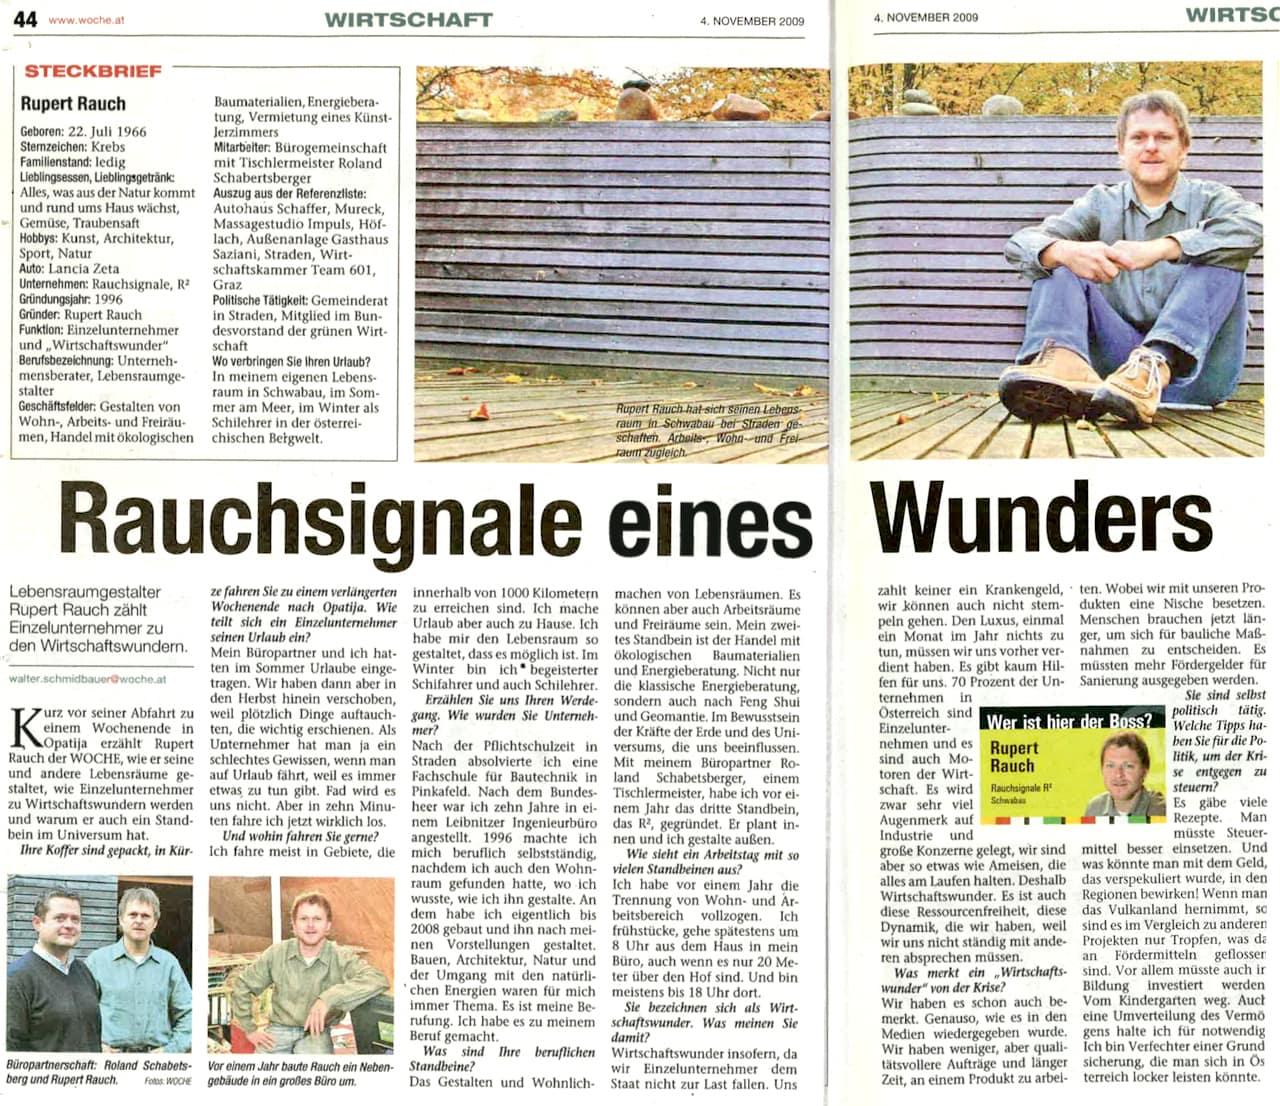 Presse_Rauchsignale_Wunders